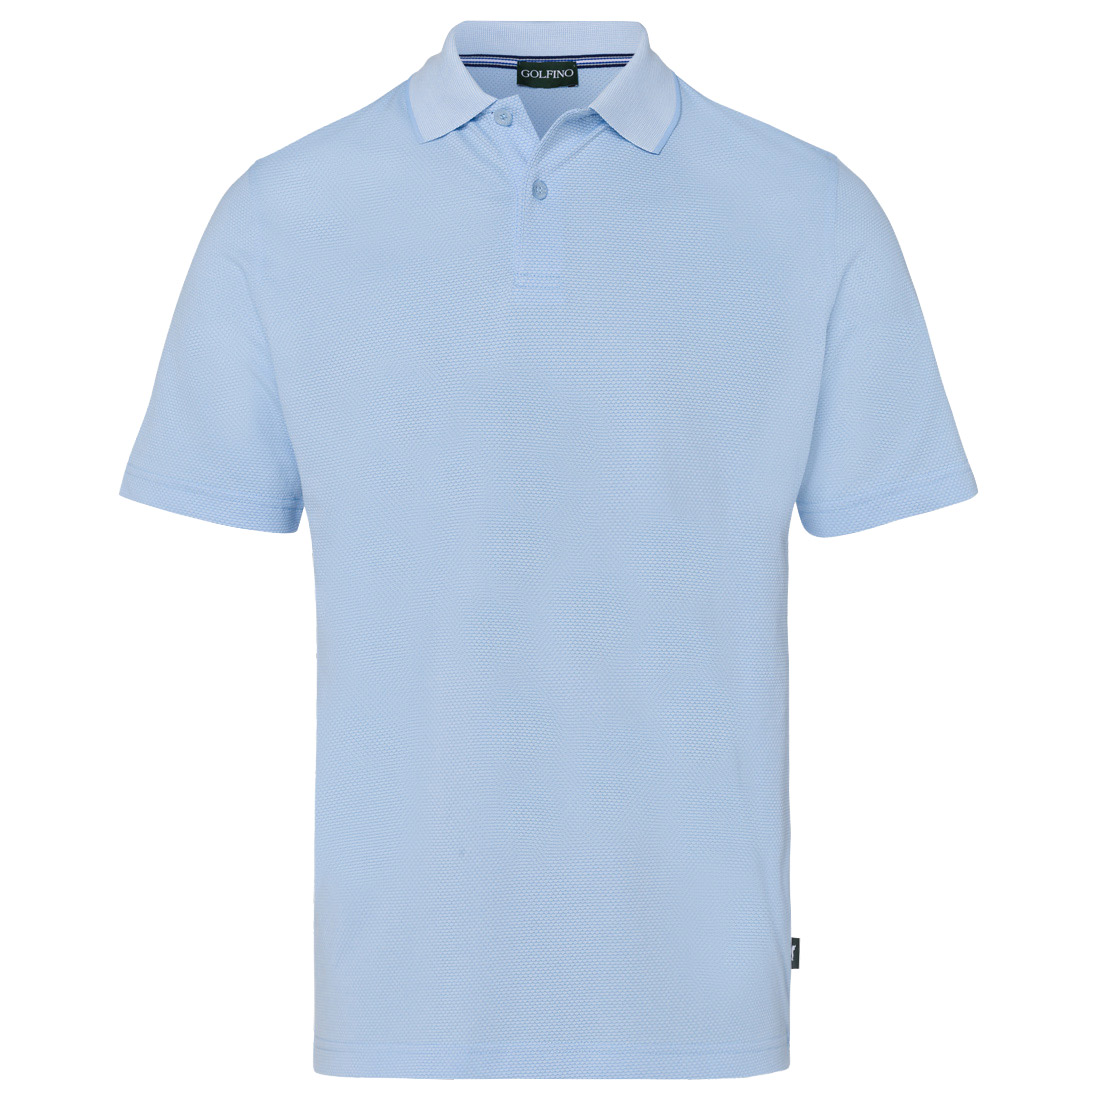 Herren Golfpolo aus feuchtigkeitsregulierendem Bubble Jacquard